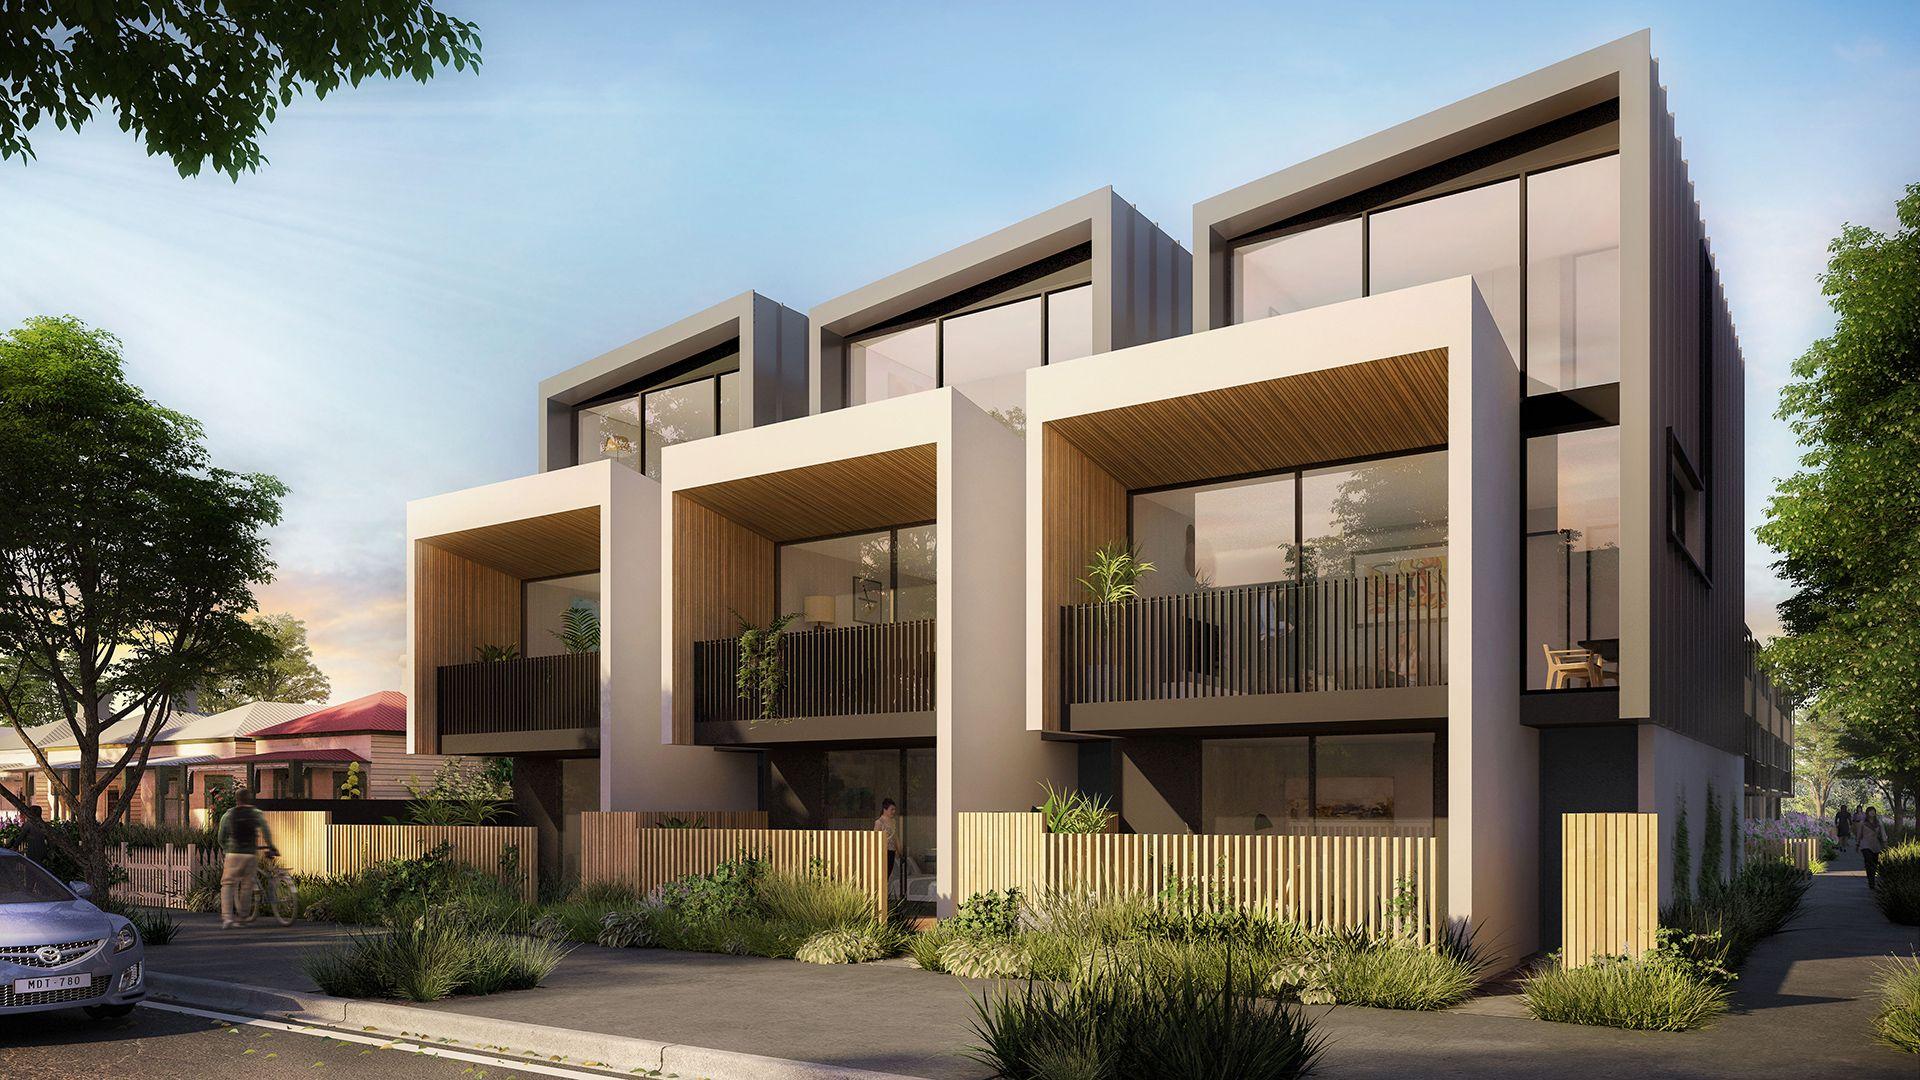 34 Cowper Street, Footscray, VIC 3011, Image 0